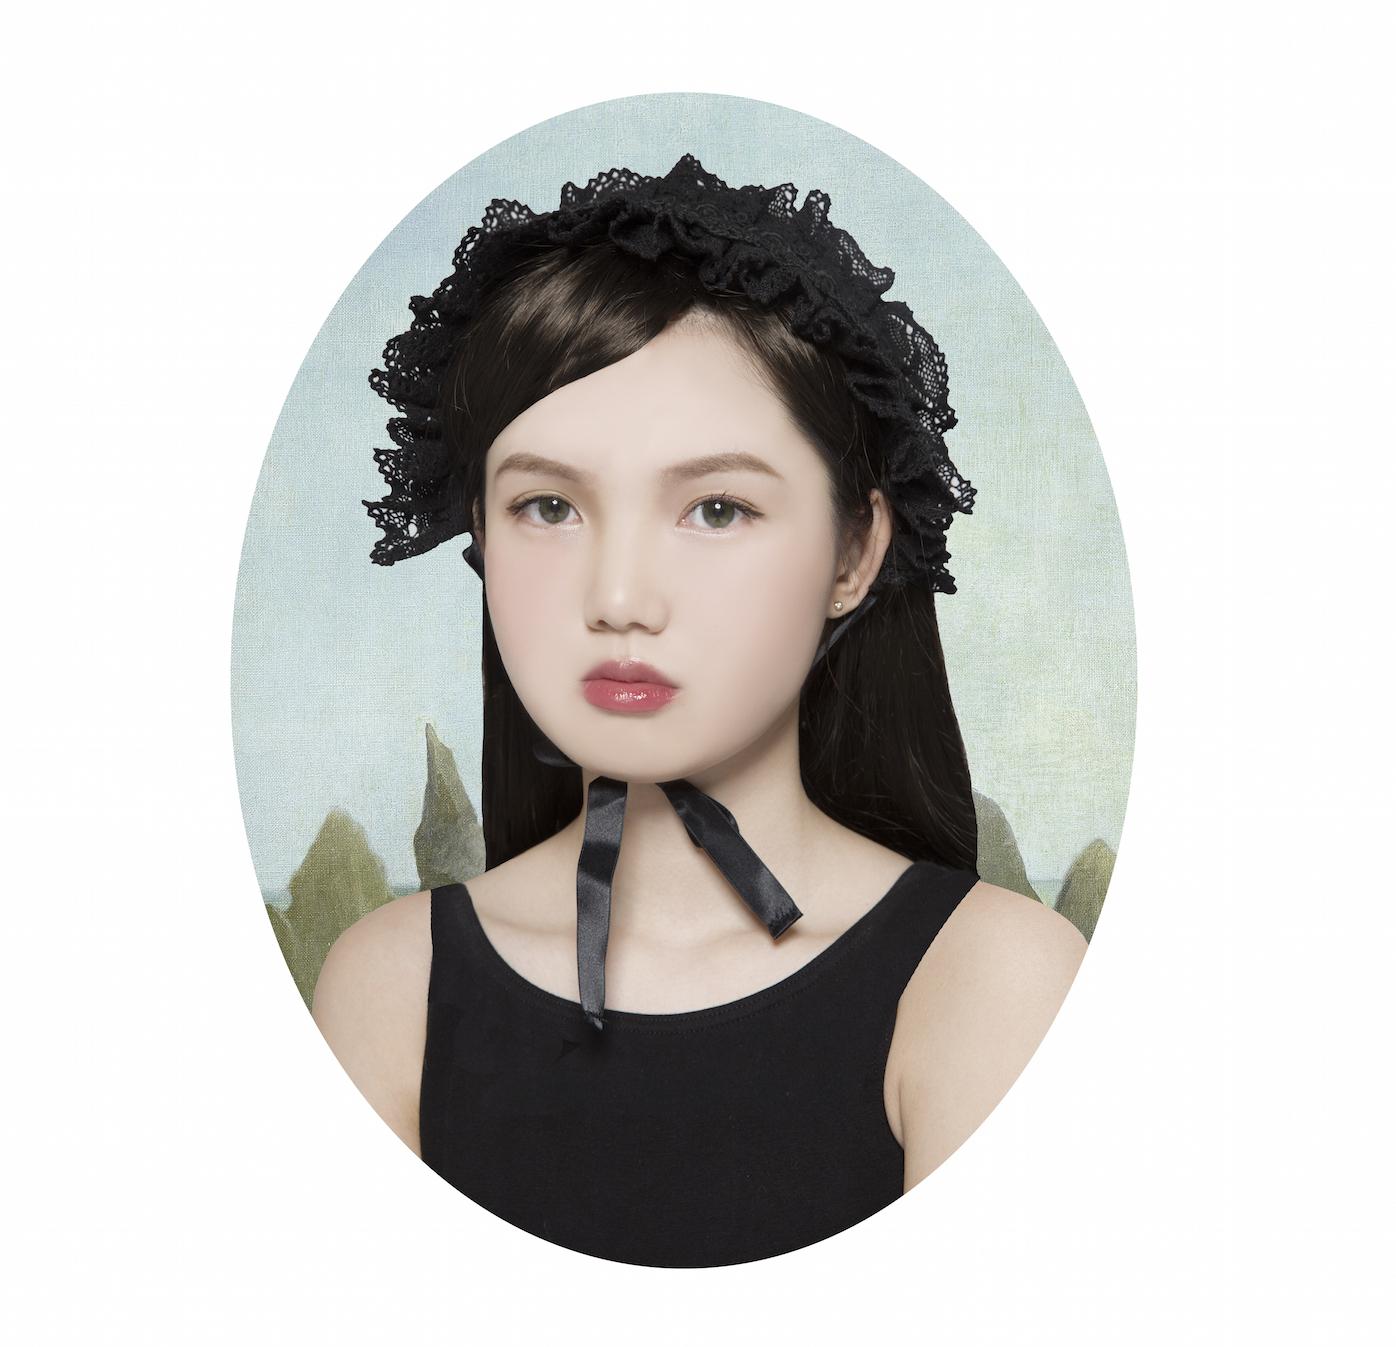 radicale renaissanceportretten van aziatische vrouwen i d